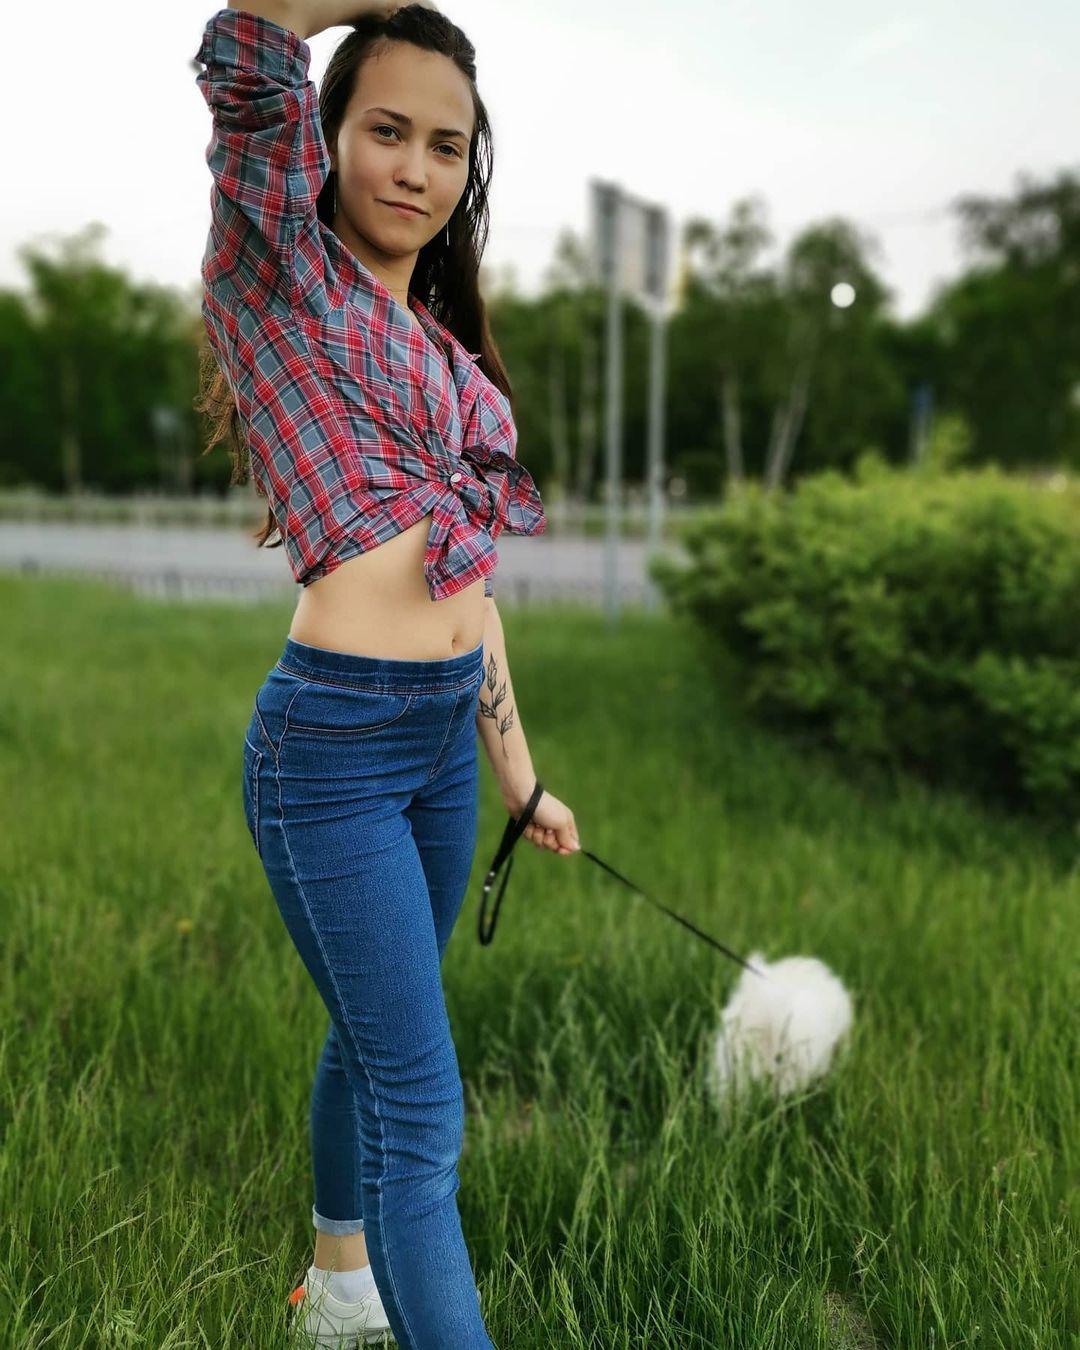 Anna-Volnix-Wallpapers-Insta-Fit-Bio-4